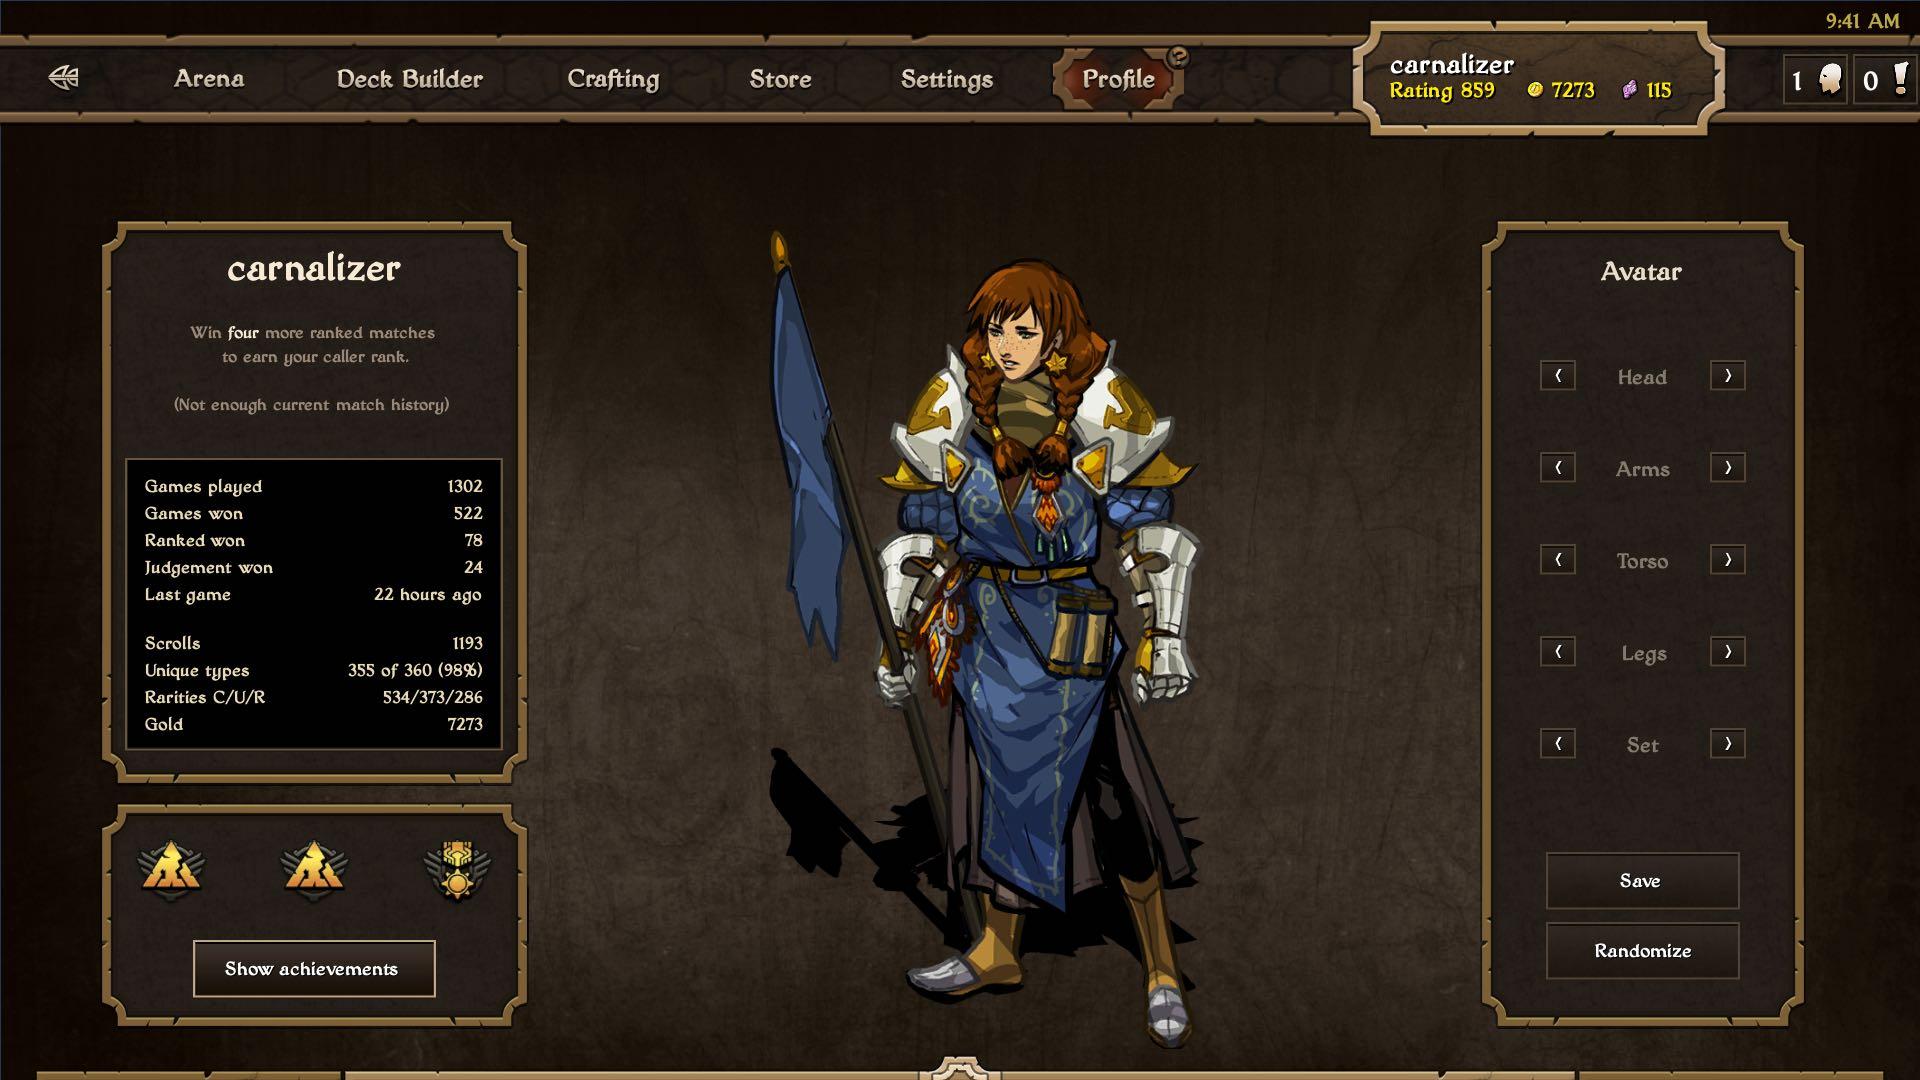 Mojang Scrolls screenshot 004